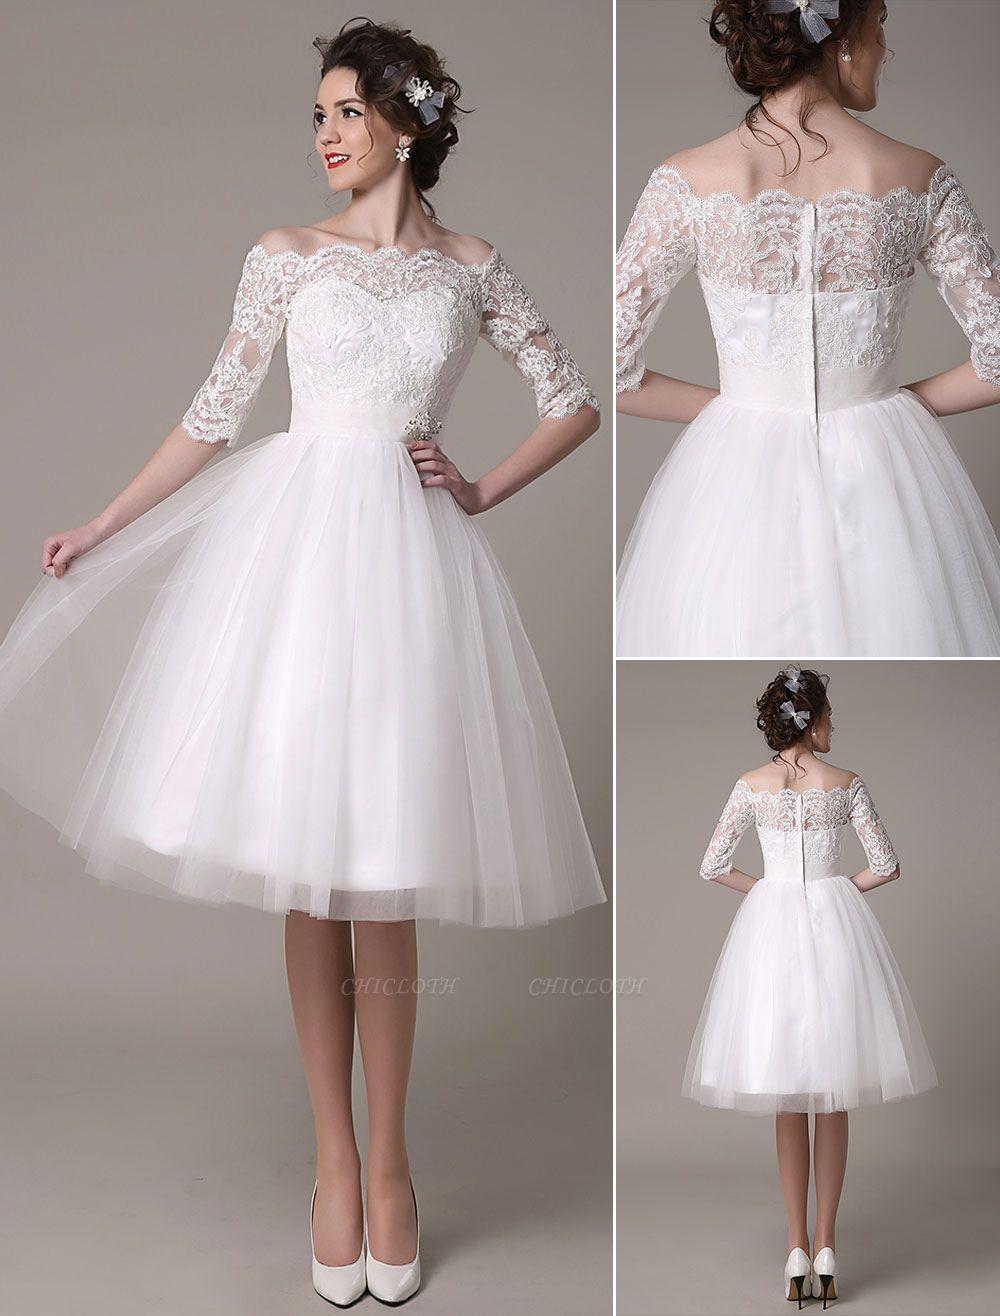 Lace Bridal Dresses 2021 Short Off The Shoulder A Line Knee Length Waist Rhinestone Bridal Dress Exclusive